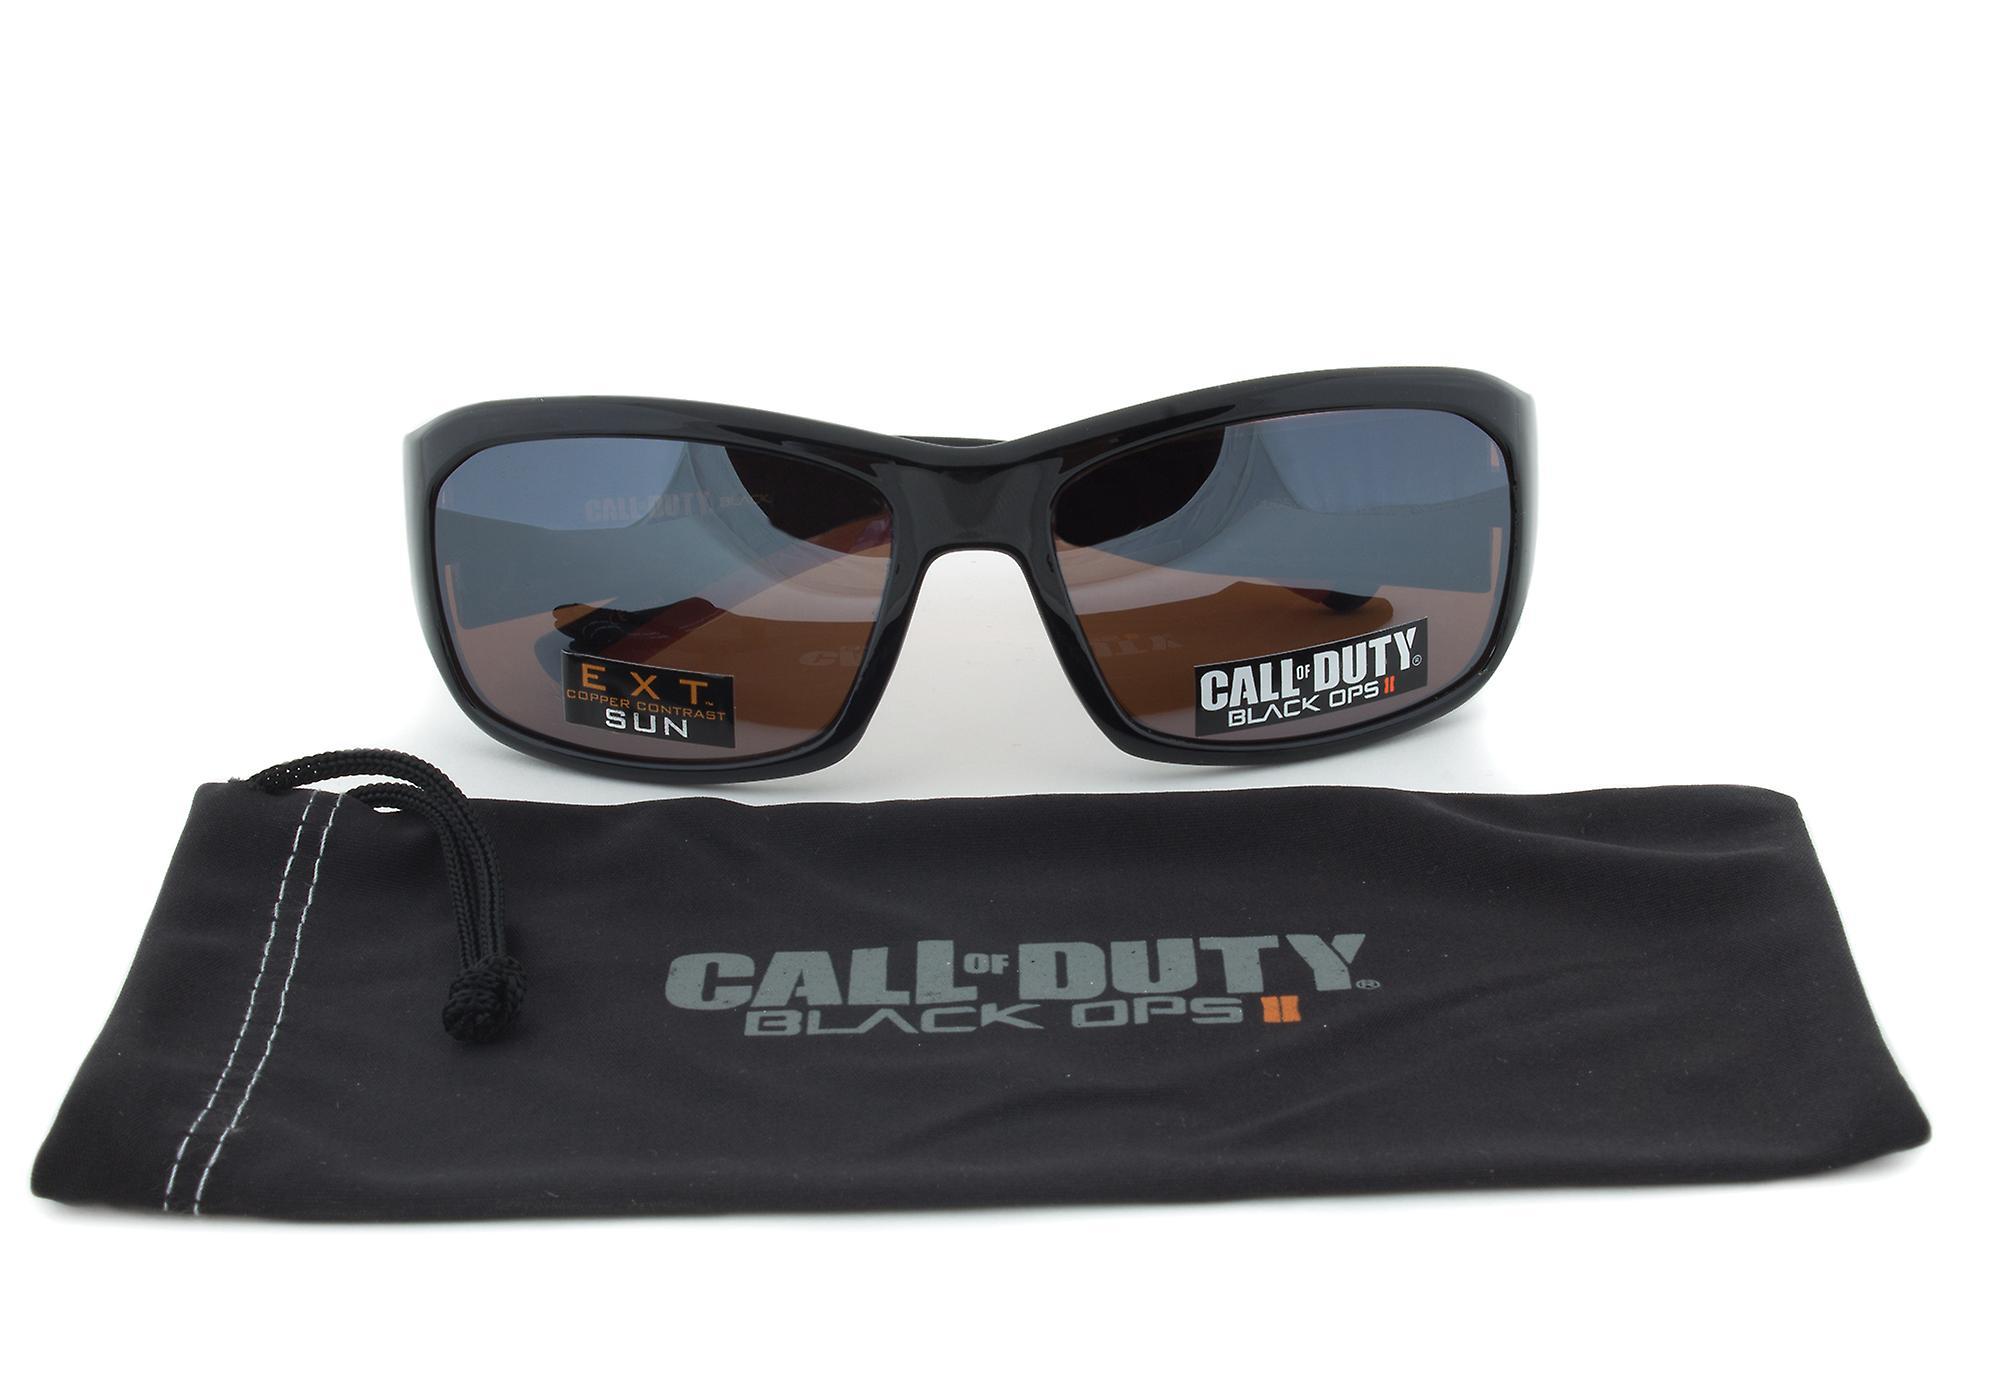 Call of Duty Black Ops Rectangular Sunglasses